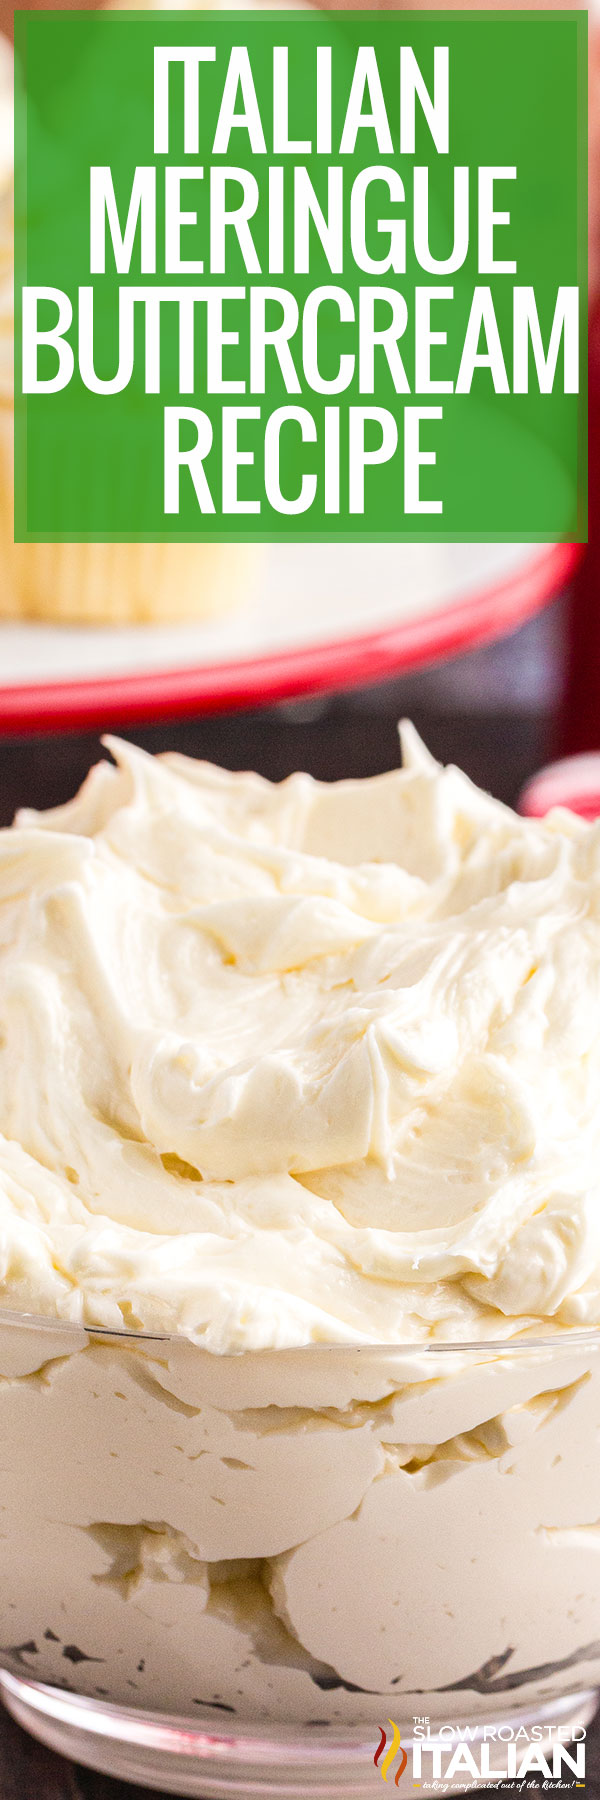 Italian Meringue Buttercream Recipe closeup